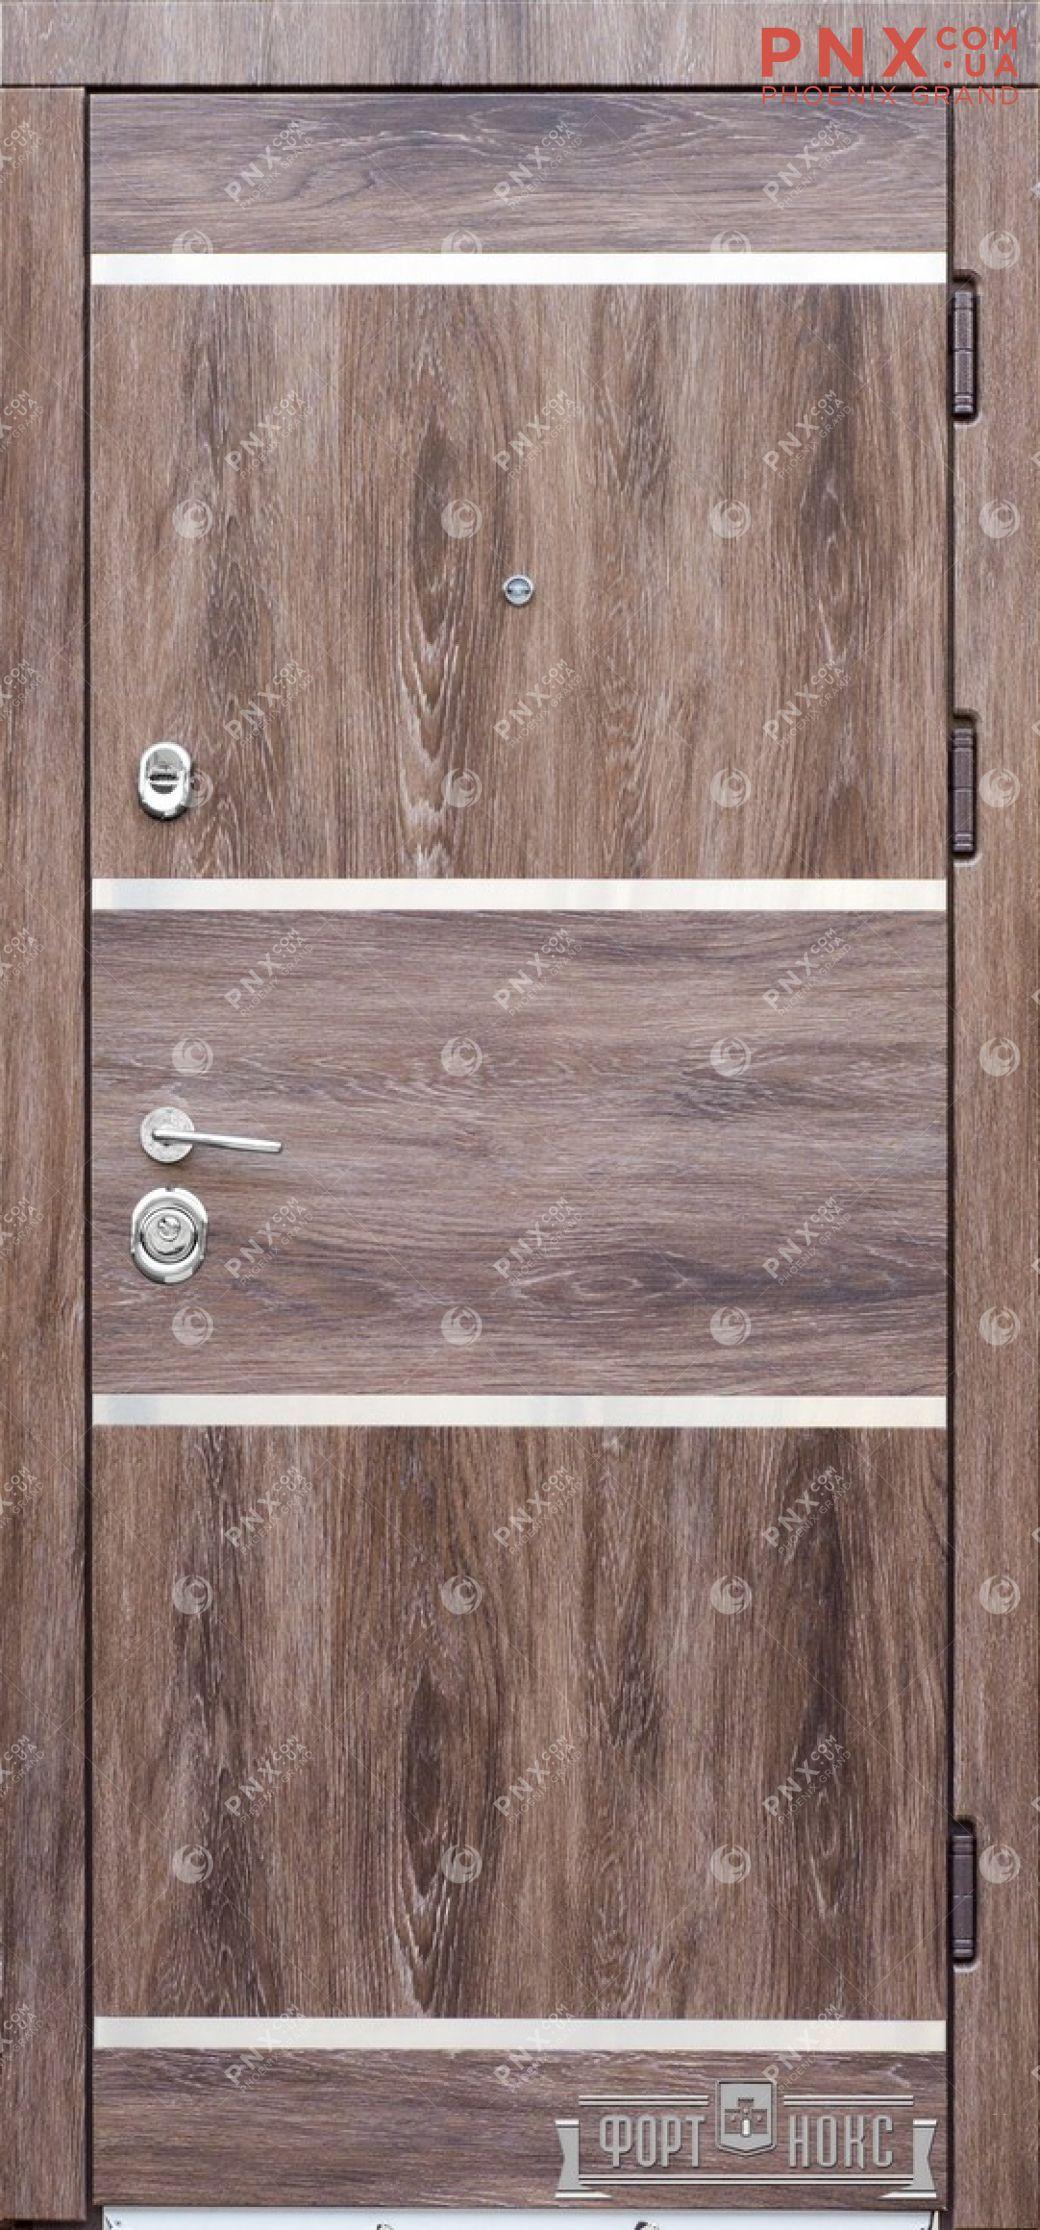 Входная дверь Форт Нокс, Стандарт, мдф/мдф Дуб шалекорица+нержавеющий молдинг